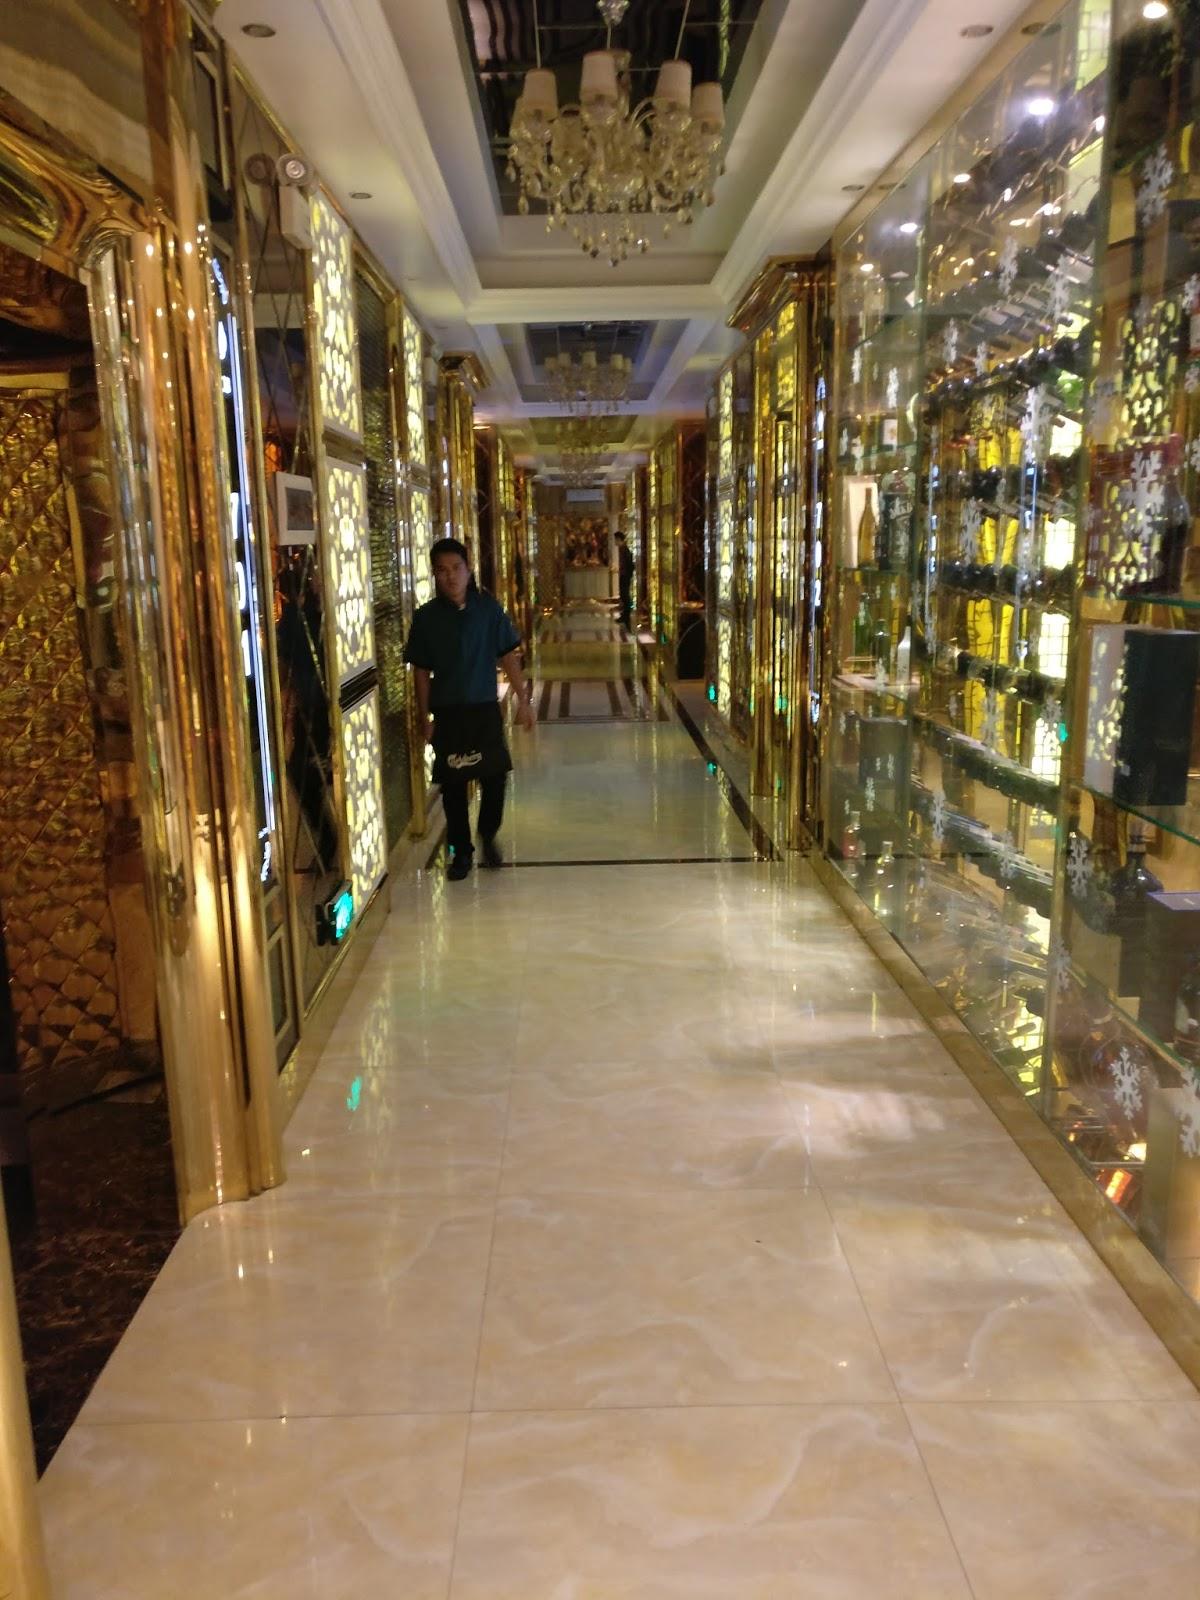 Ebo on tour: Best of the Best - der Karaoke-Tempel in Mandalay